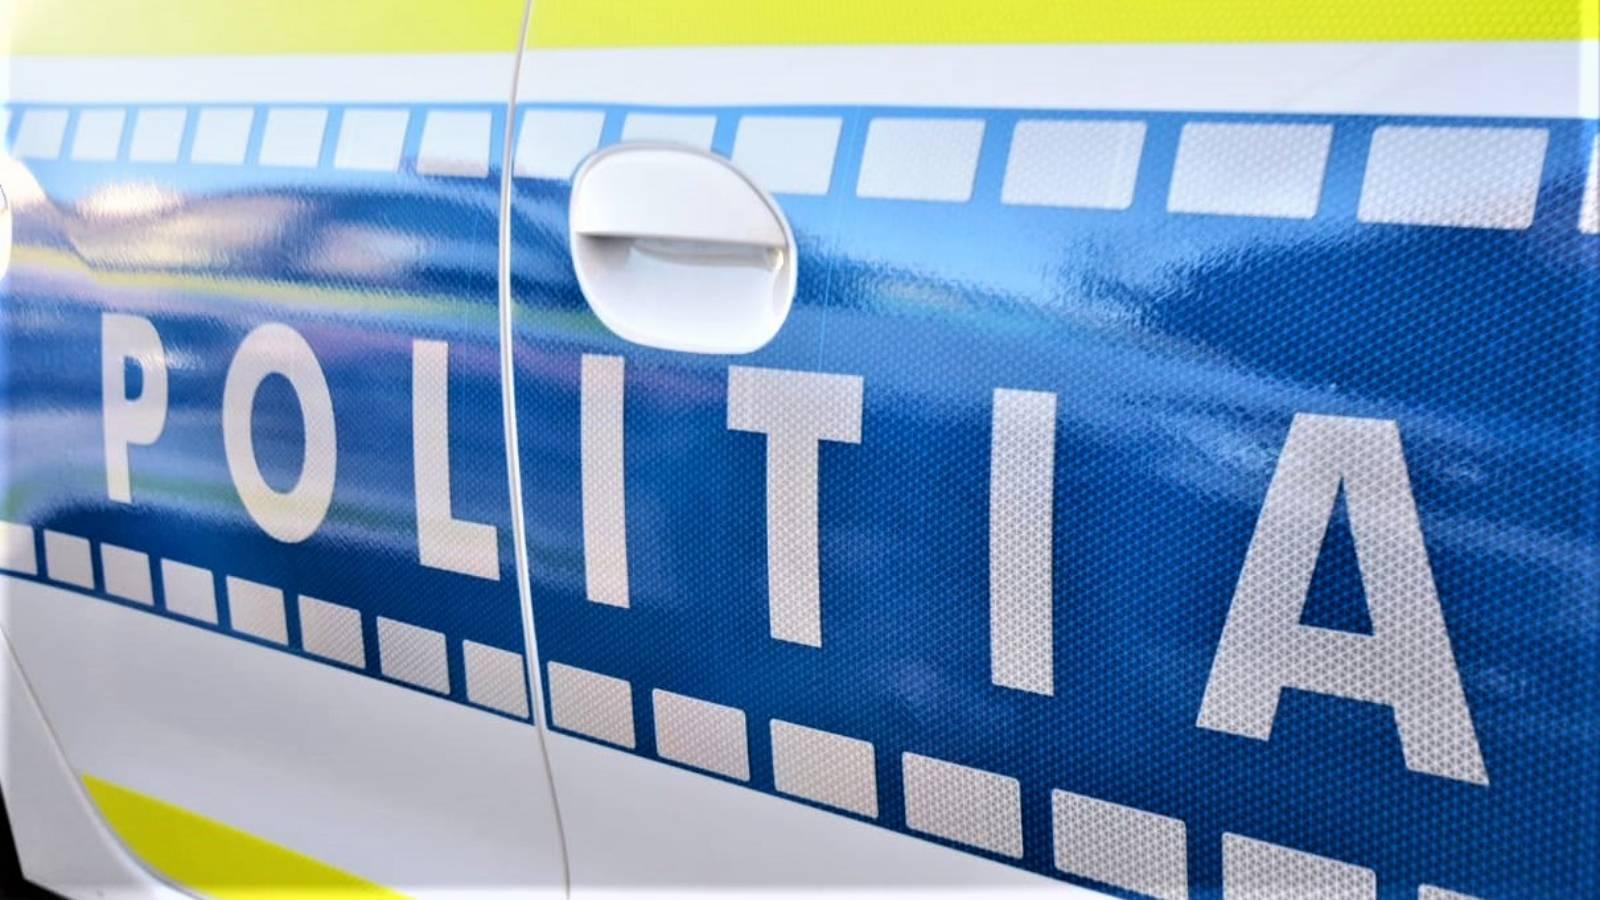 Politia Romana semnalizare